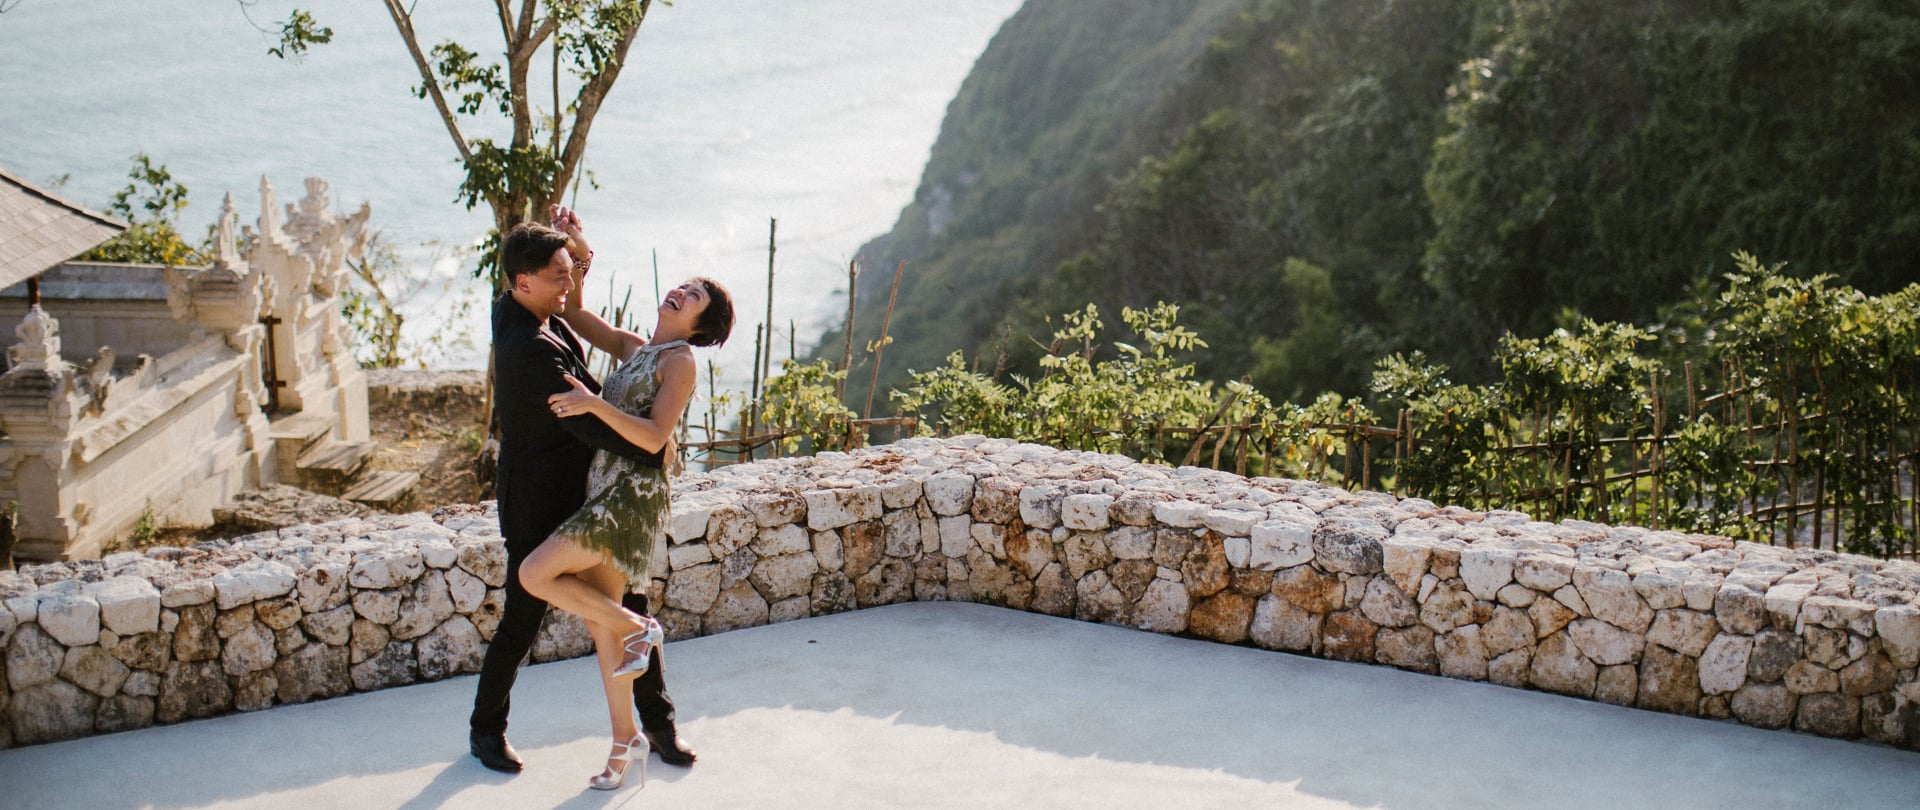 Fiona & Finian Wedding Video Filmed at Bali, Indonesia